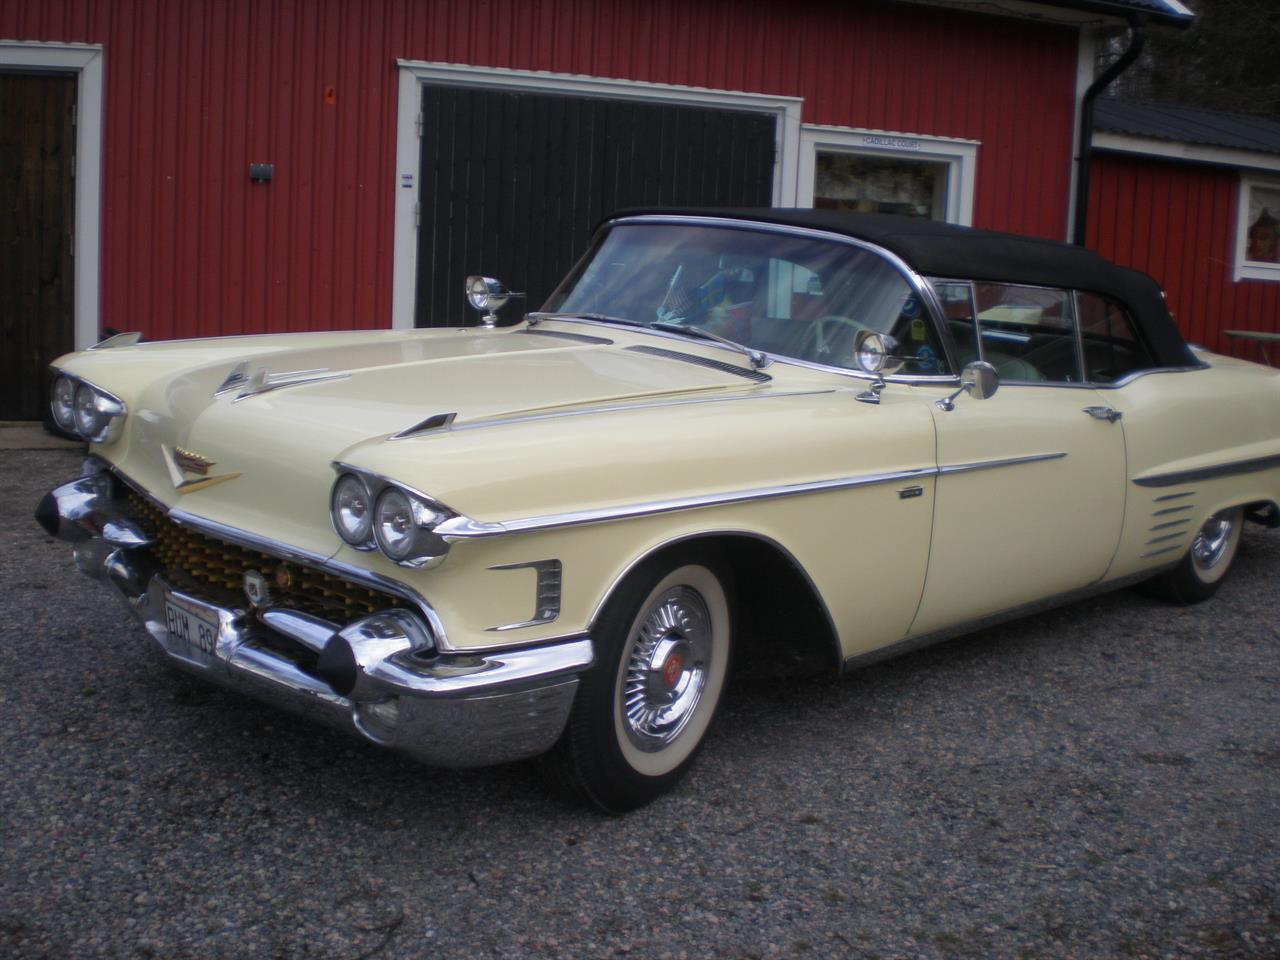 Cadillac -58 Cab